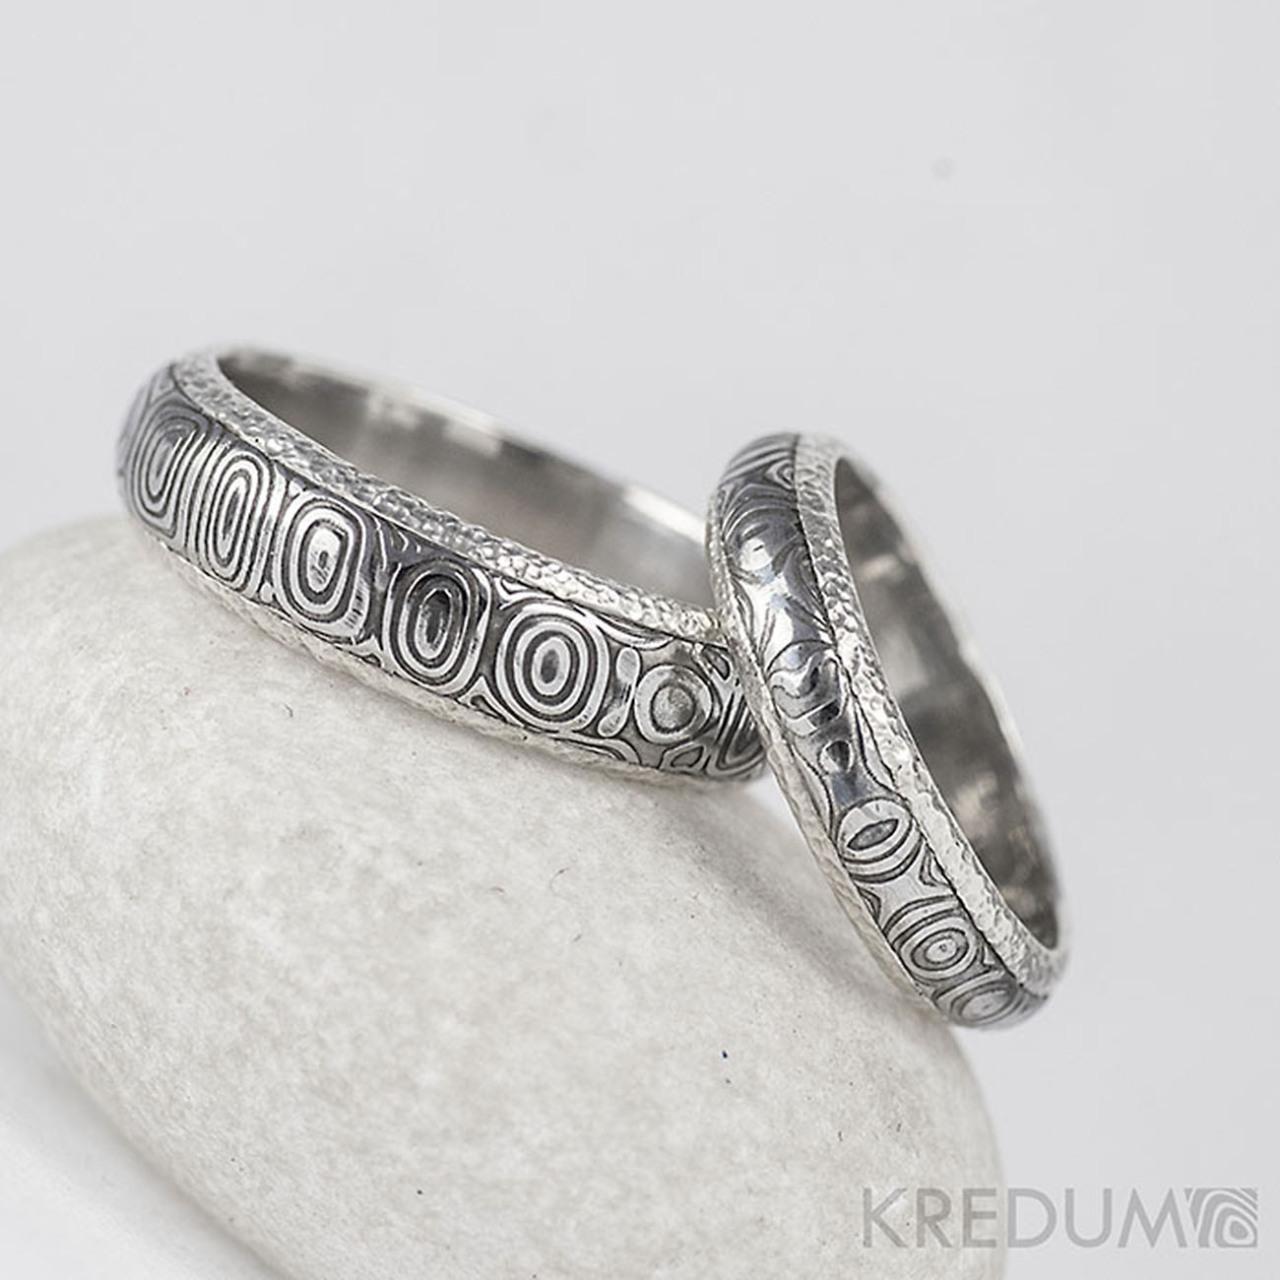 Stribrne Snubni Prsteny A Damasteel Luna Kolecka Vyroba Hand